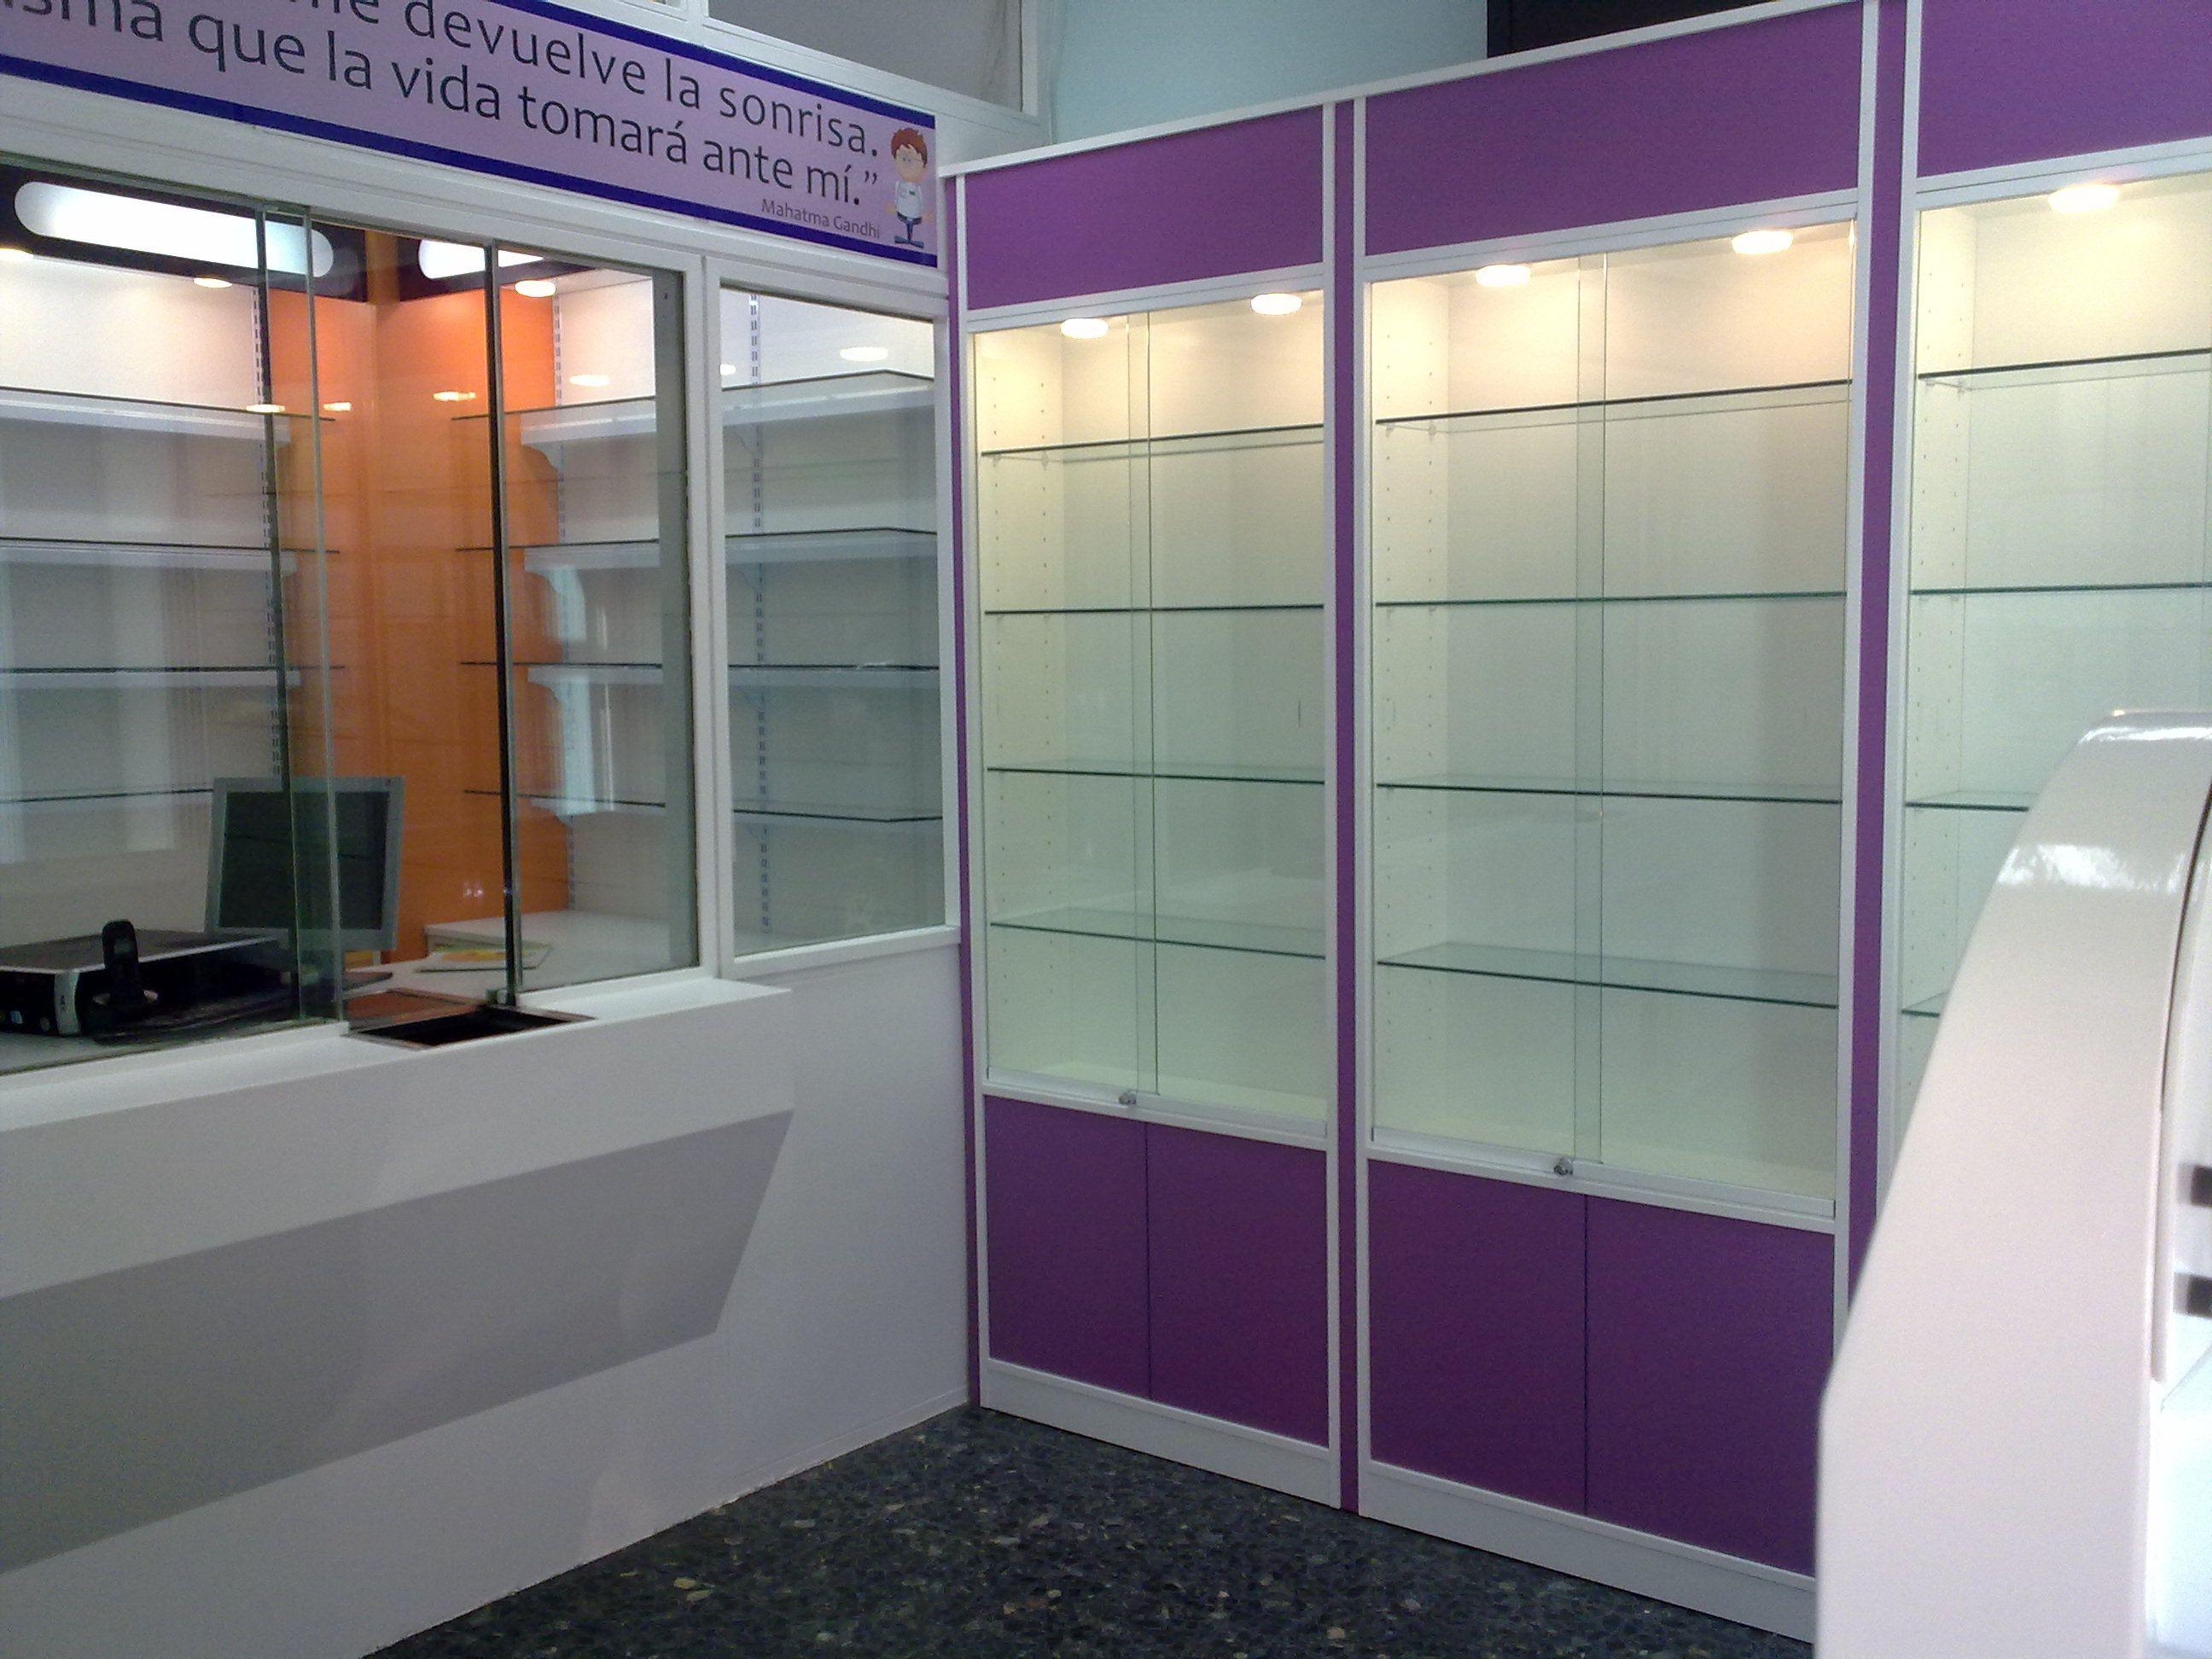 Vitrinas para tiendas en cristal o metracritlato - Vitrinas de exposicion ...